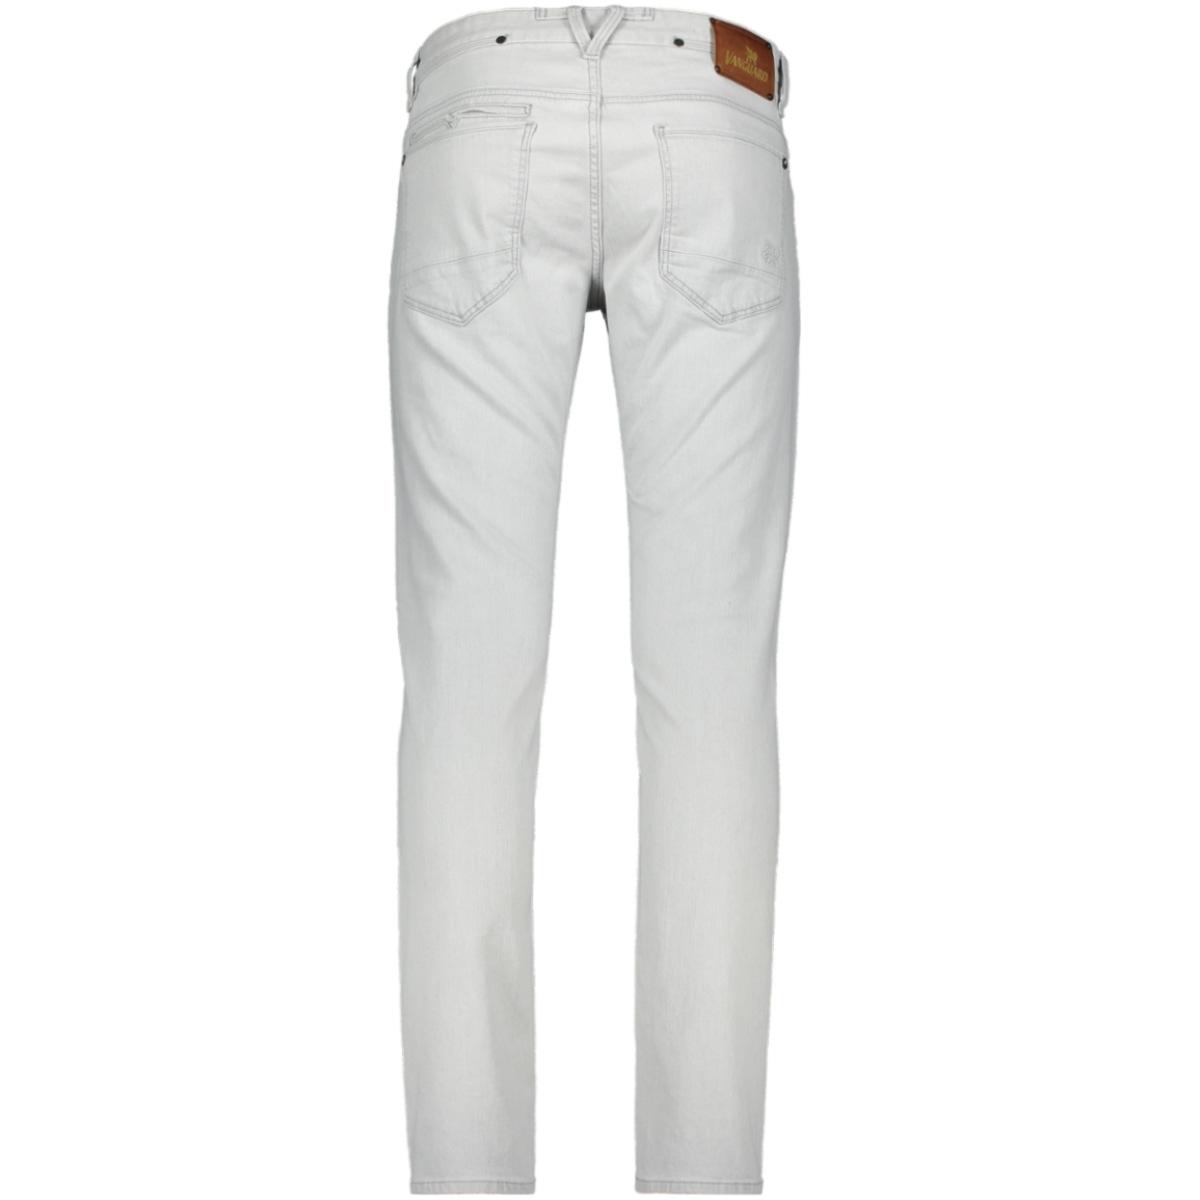 v850 rider colored denim vanguard jeans 9090